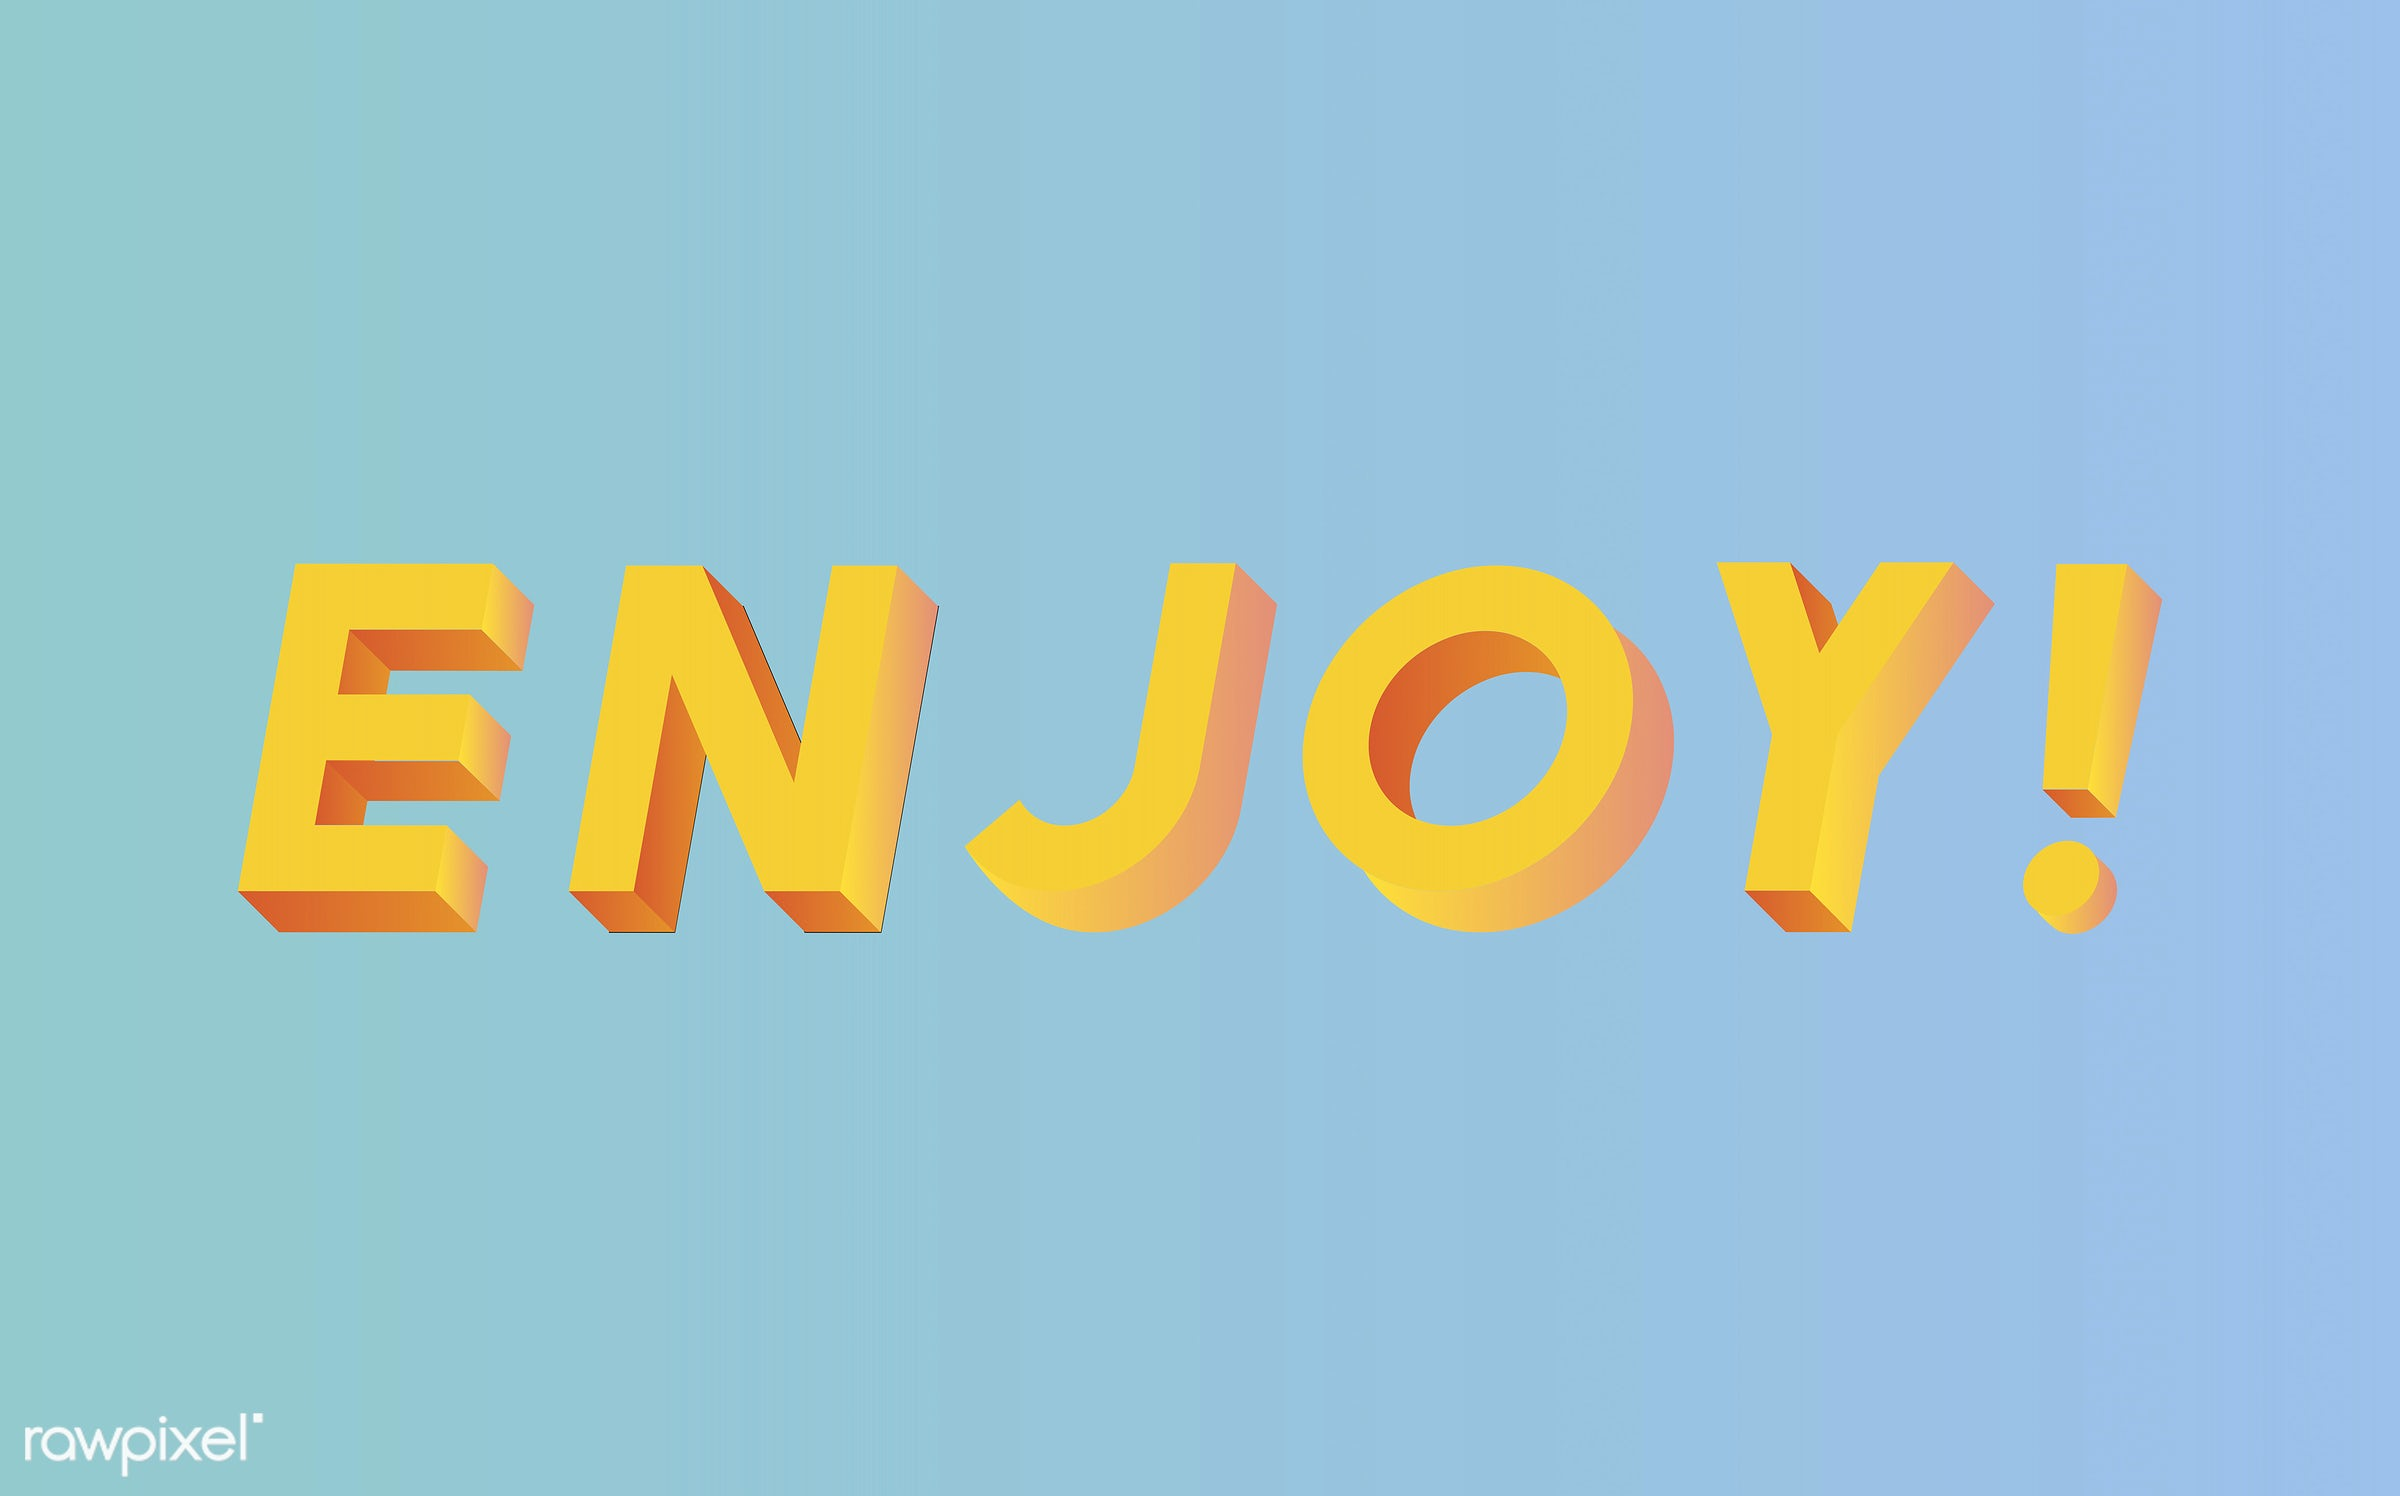 neon, colorful, 3d, three dimensional, vector, illustration, graphic, word, blue, yellow, enjoy, joy, enjoyment